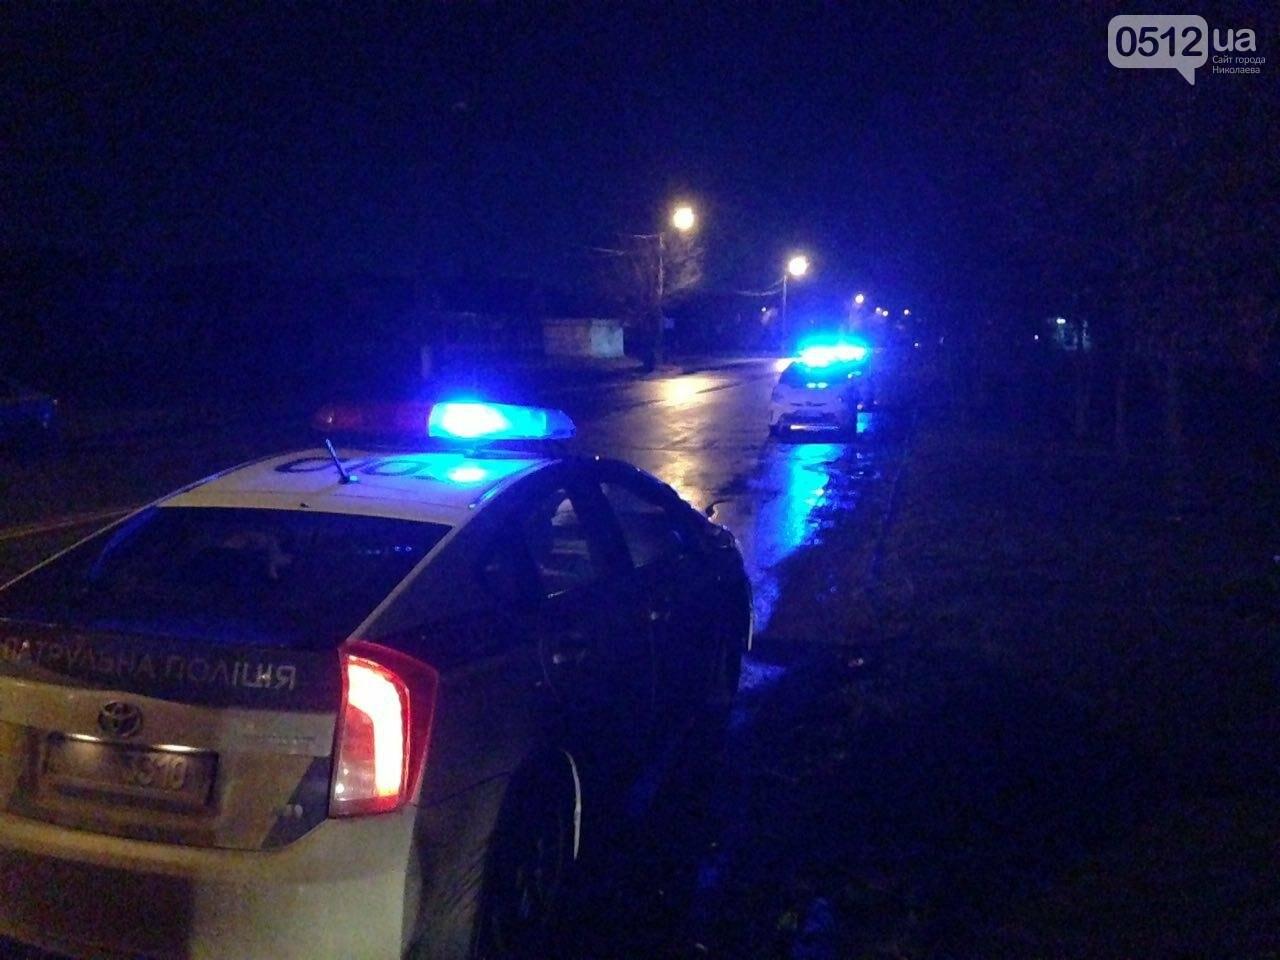 Страшное ДТП в Николаеве: 2 парня и 2 девушки на Мазде влетели в дерево - водитель умер на месте аварии, - ФОТО, фото-9